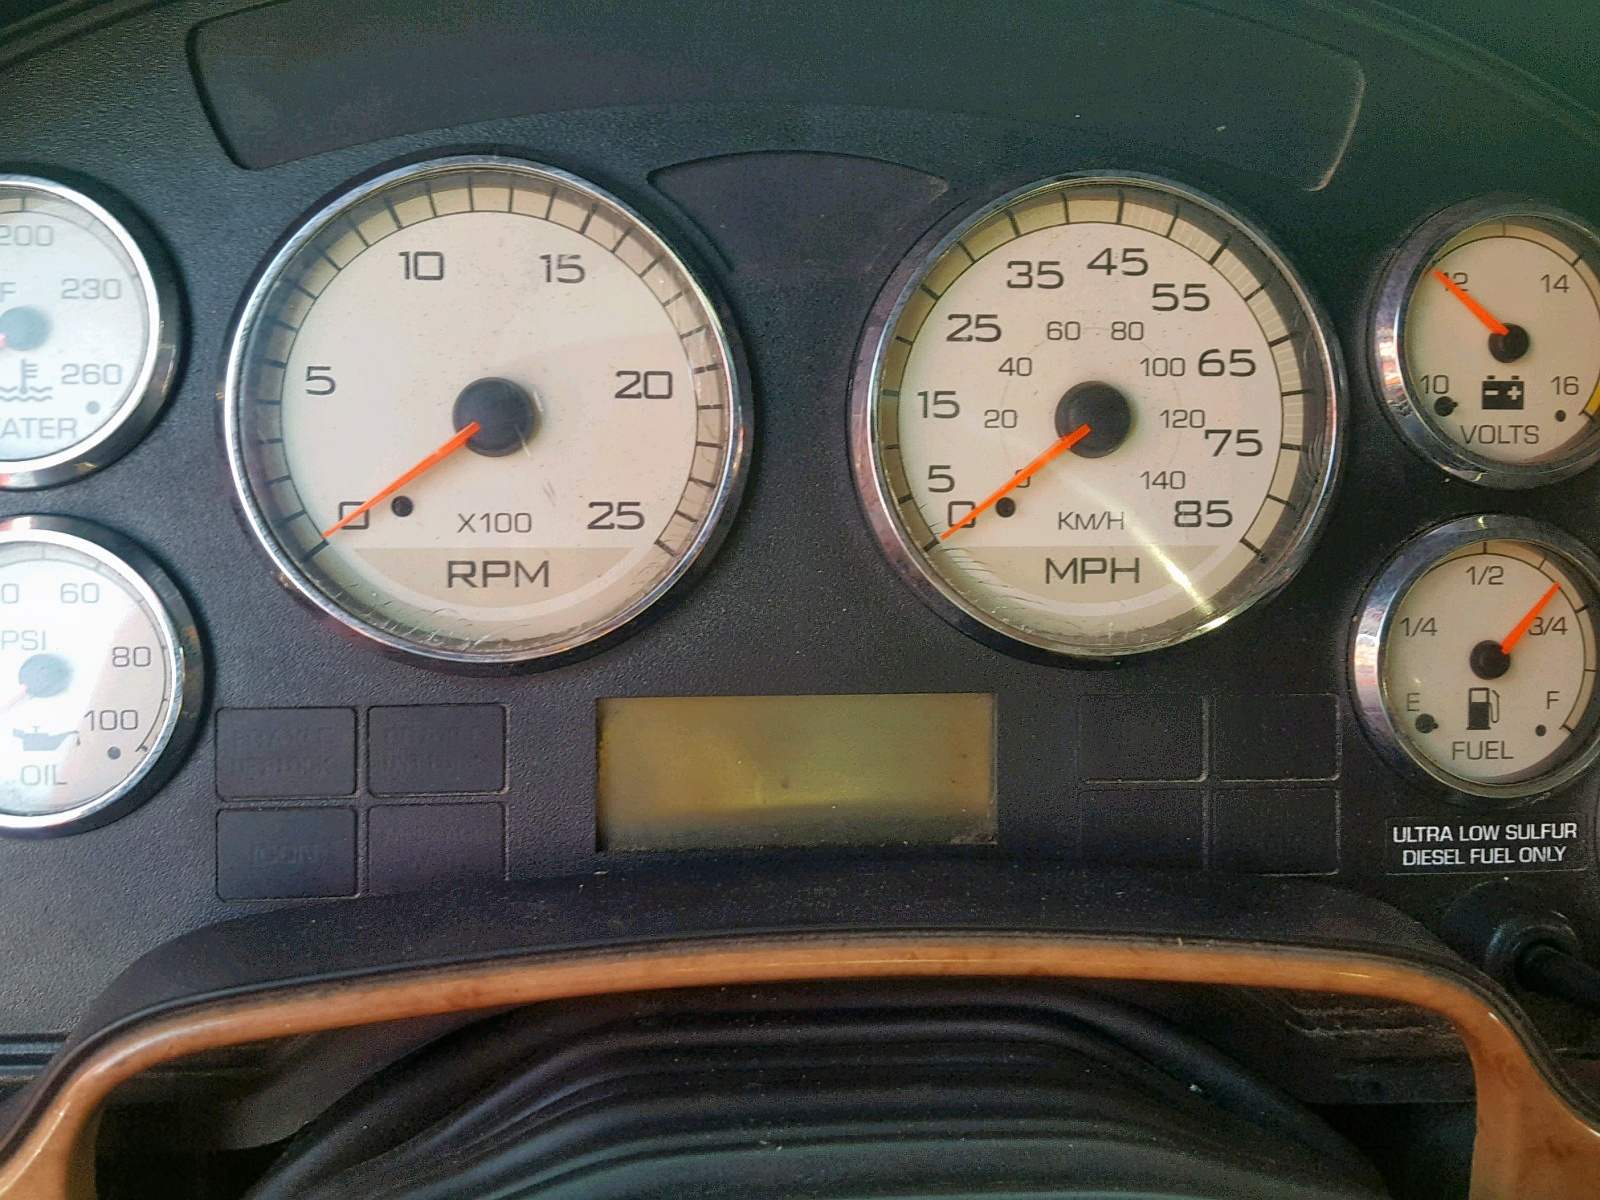 2010 International Prostar Pr 14.9L front view